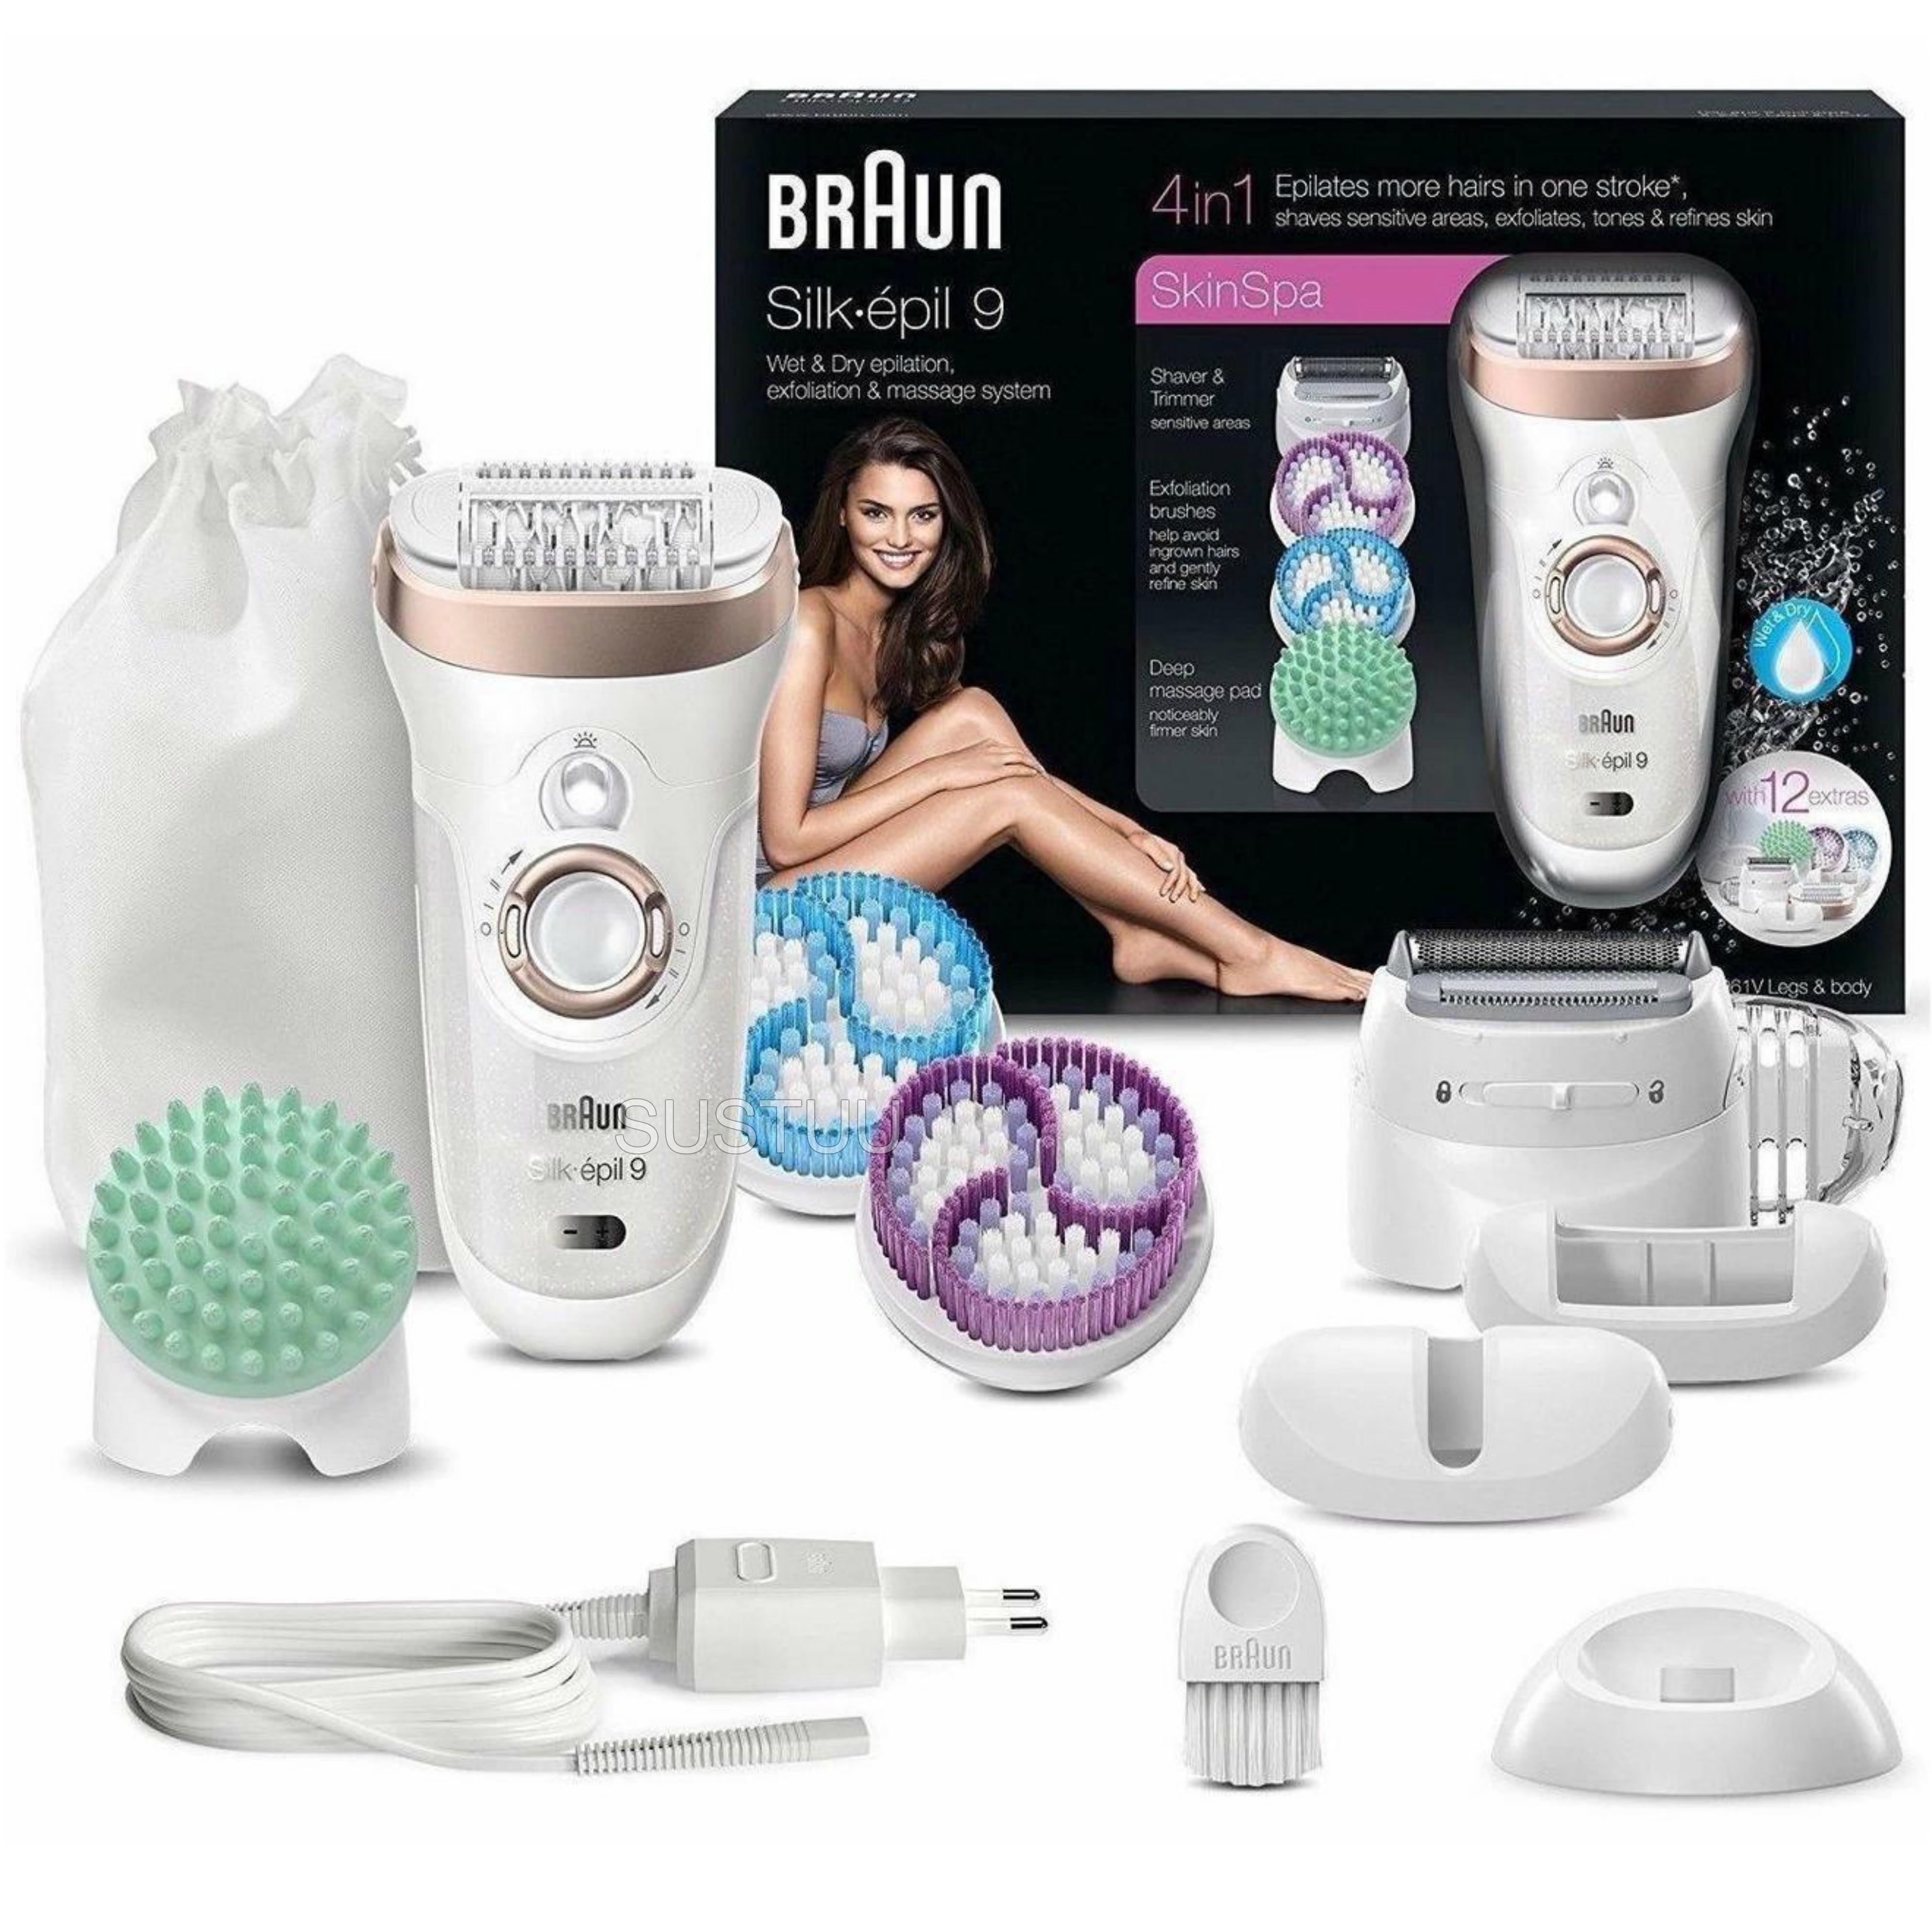 Braun Silk-Epil 9 Skin Spa|Epilation-Exfoliation-Massage-Shaver|4 in 1|Multi Use